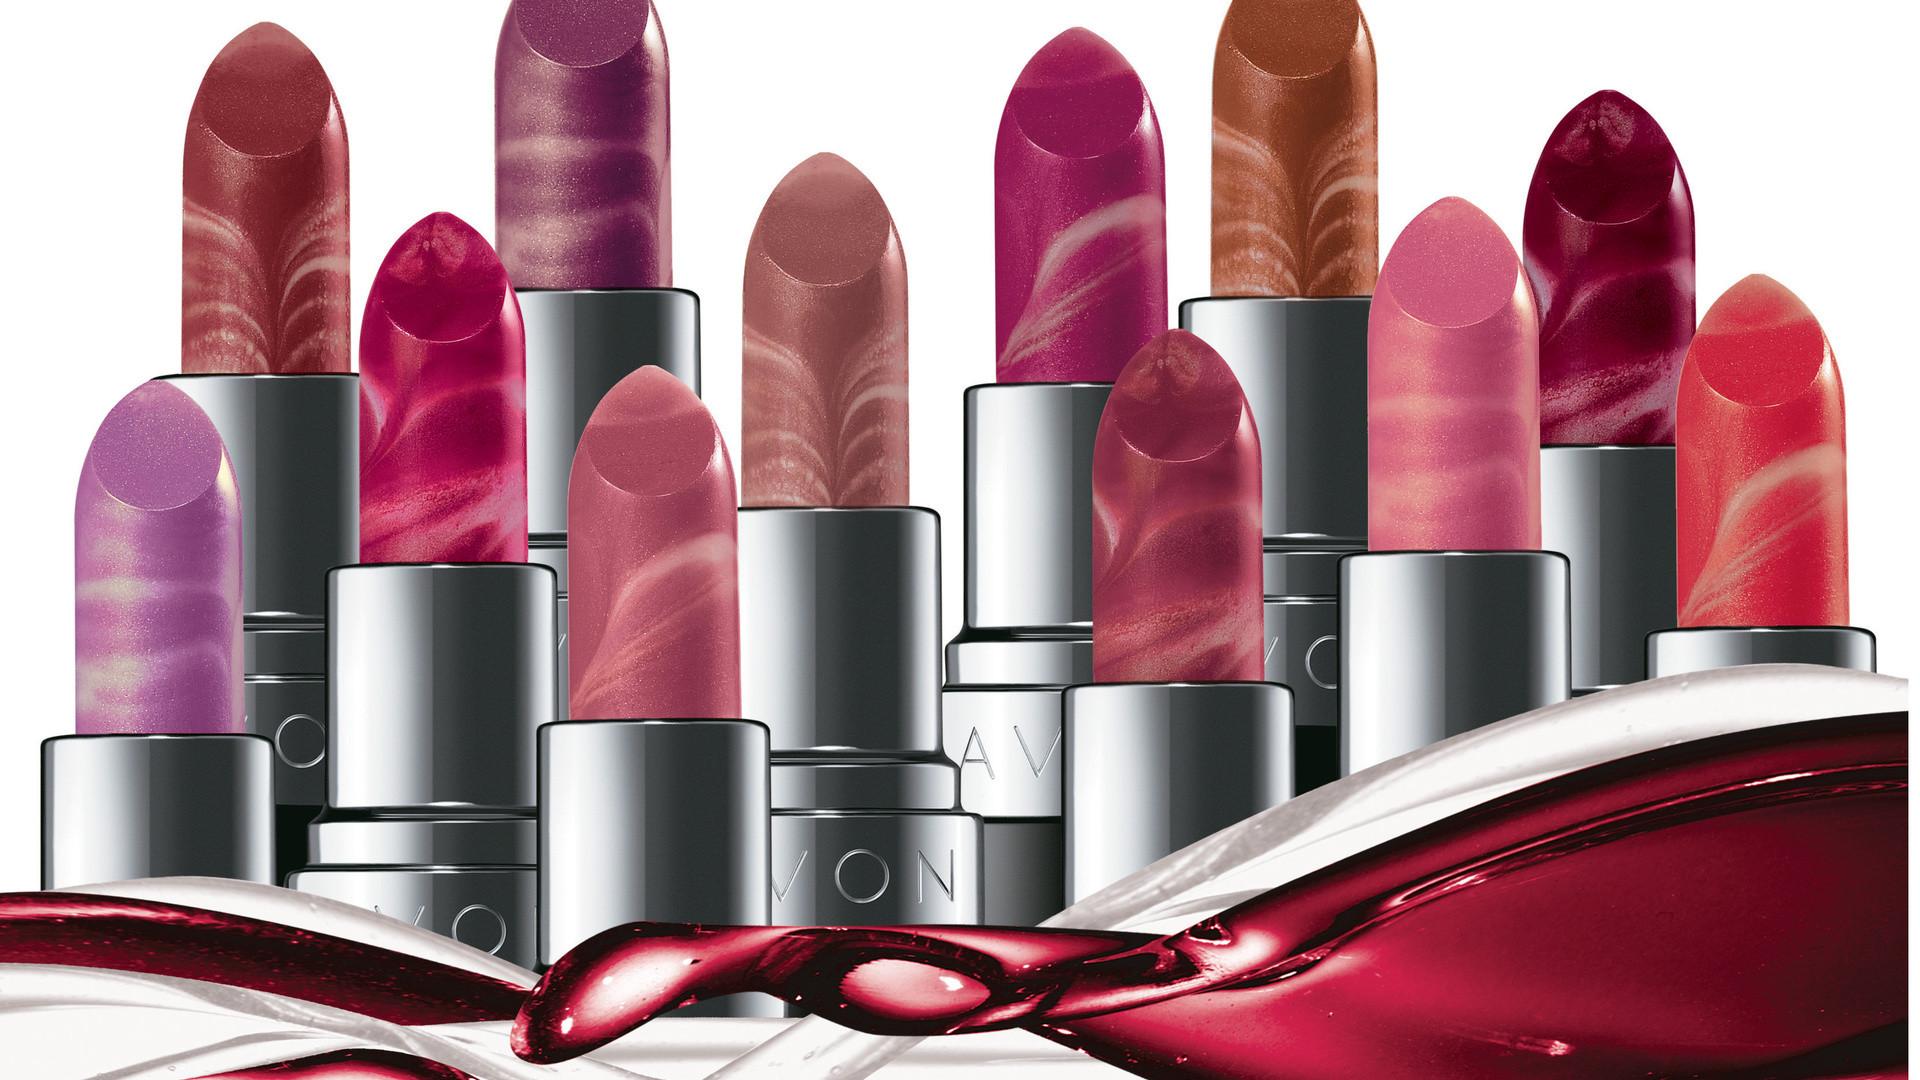 Lipstick Desktop Wallpaper (59+ images)